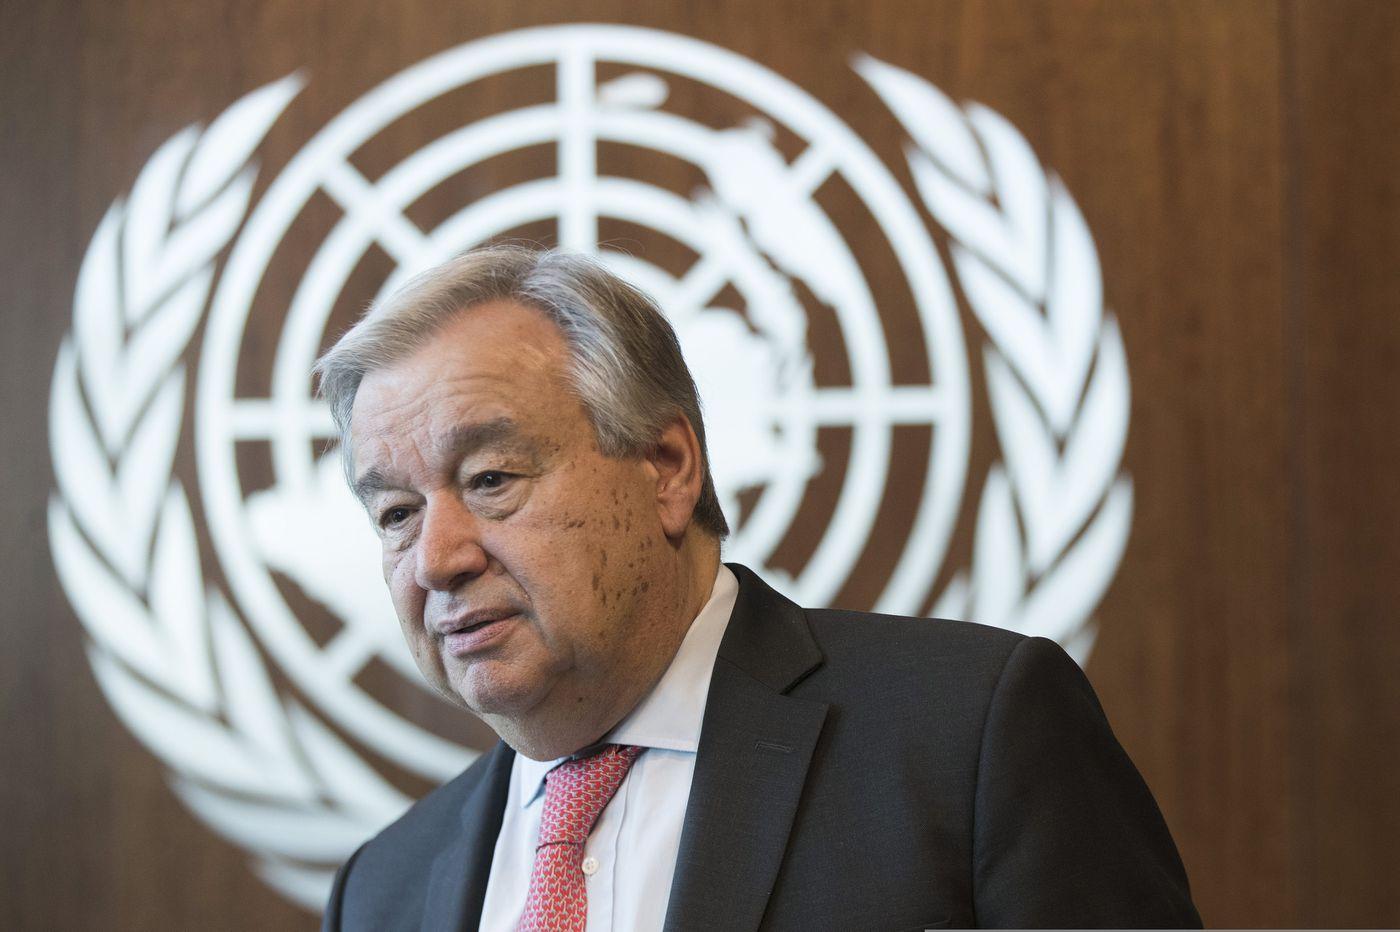 'We're losing the race:' U.N. secretary general calls climate change an emergency